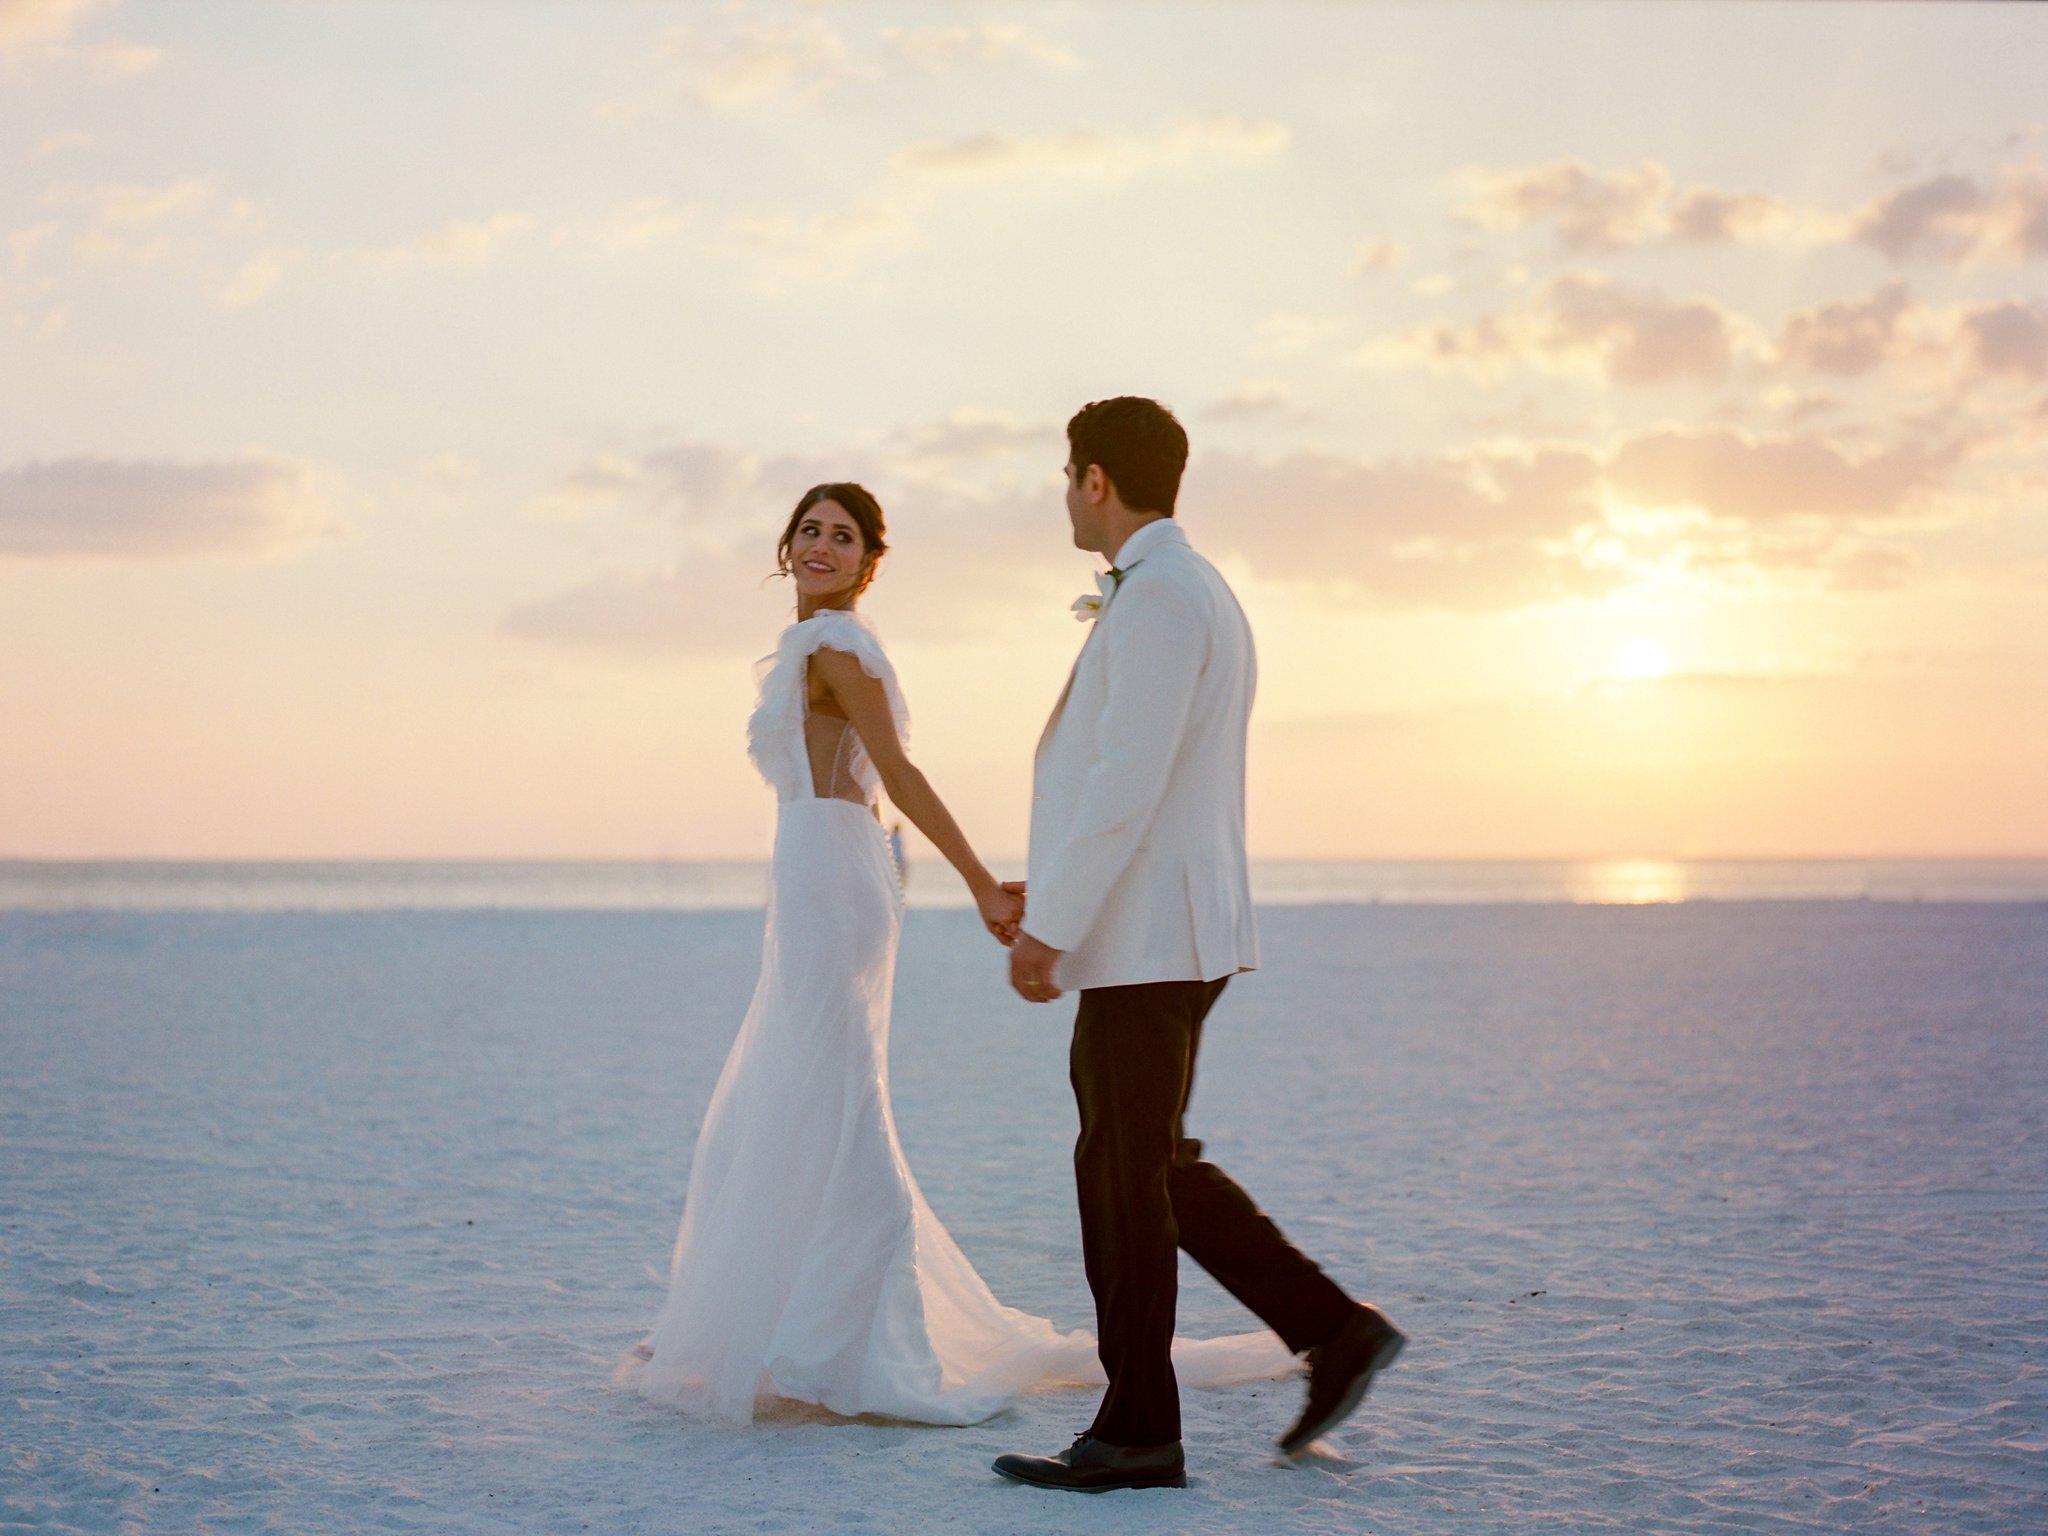 jw marriott marco island wedding photographer marco island wedding photographer shannon griffin photography_0194.jpg